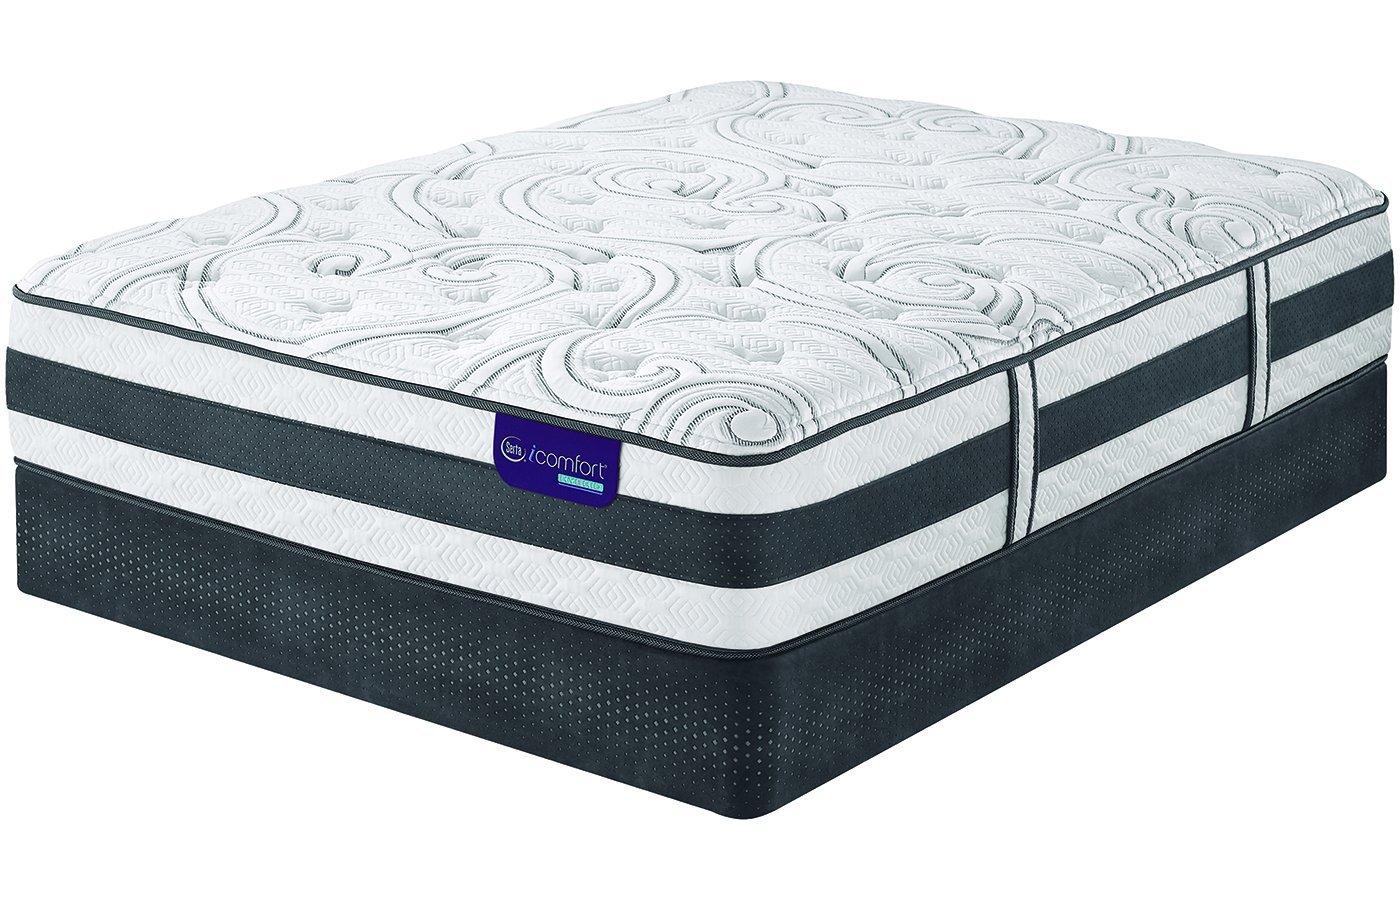 amazon com serta queen icomfort hybrid applause ii plush mattress